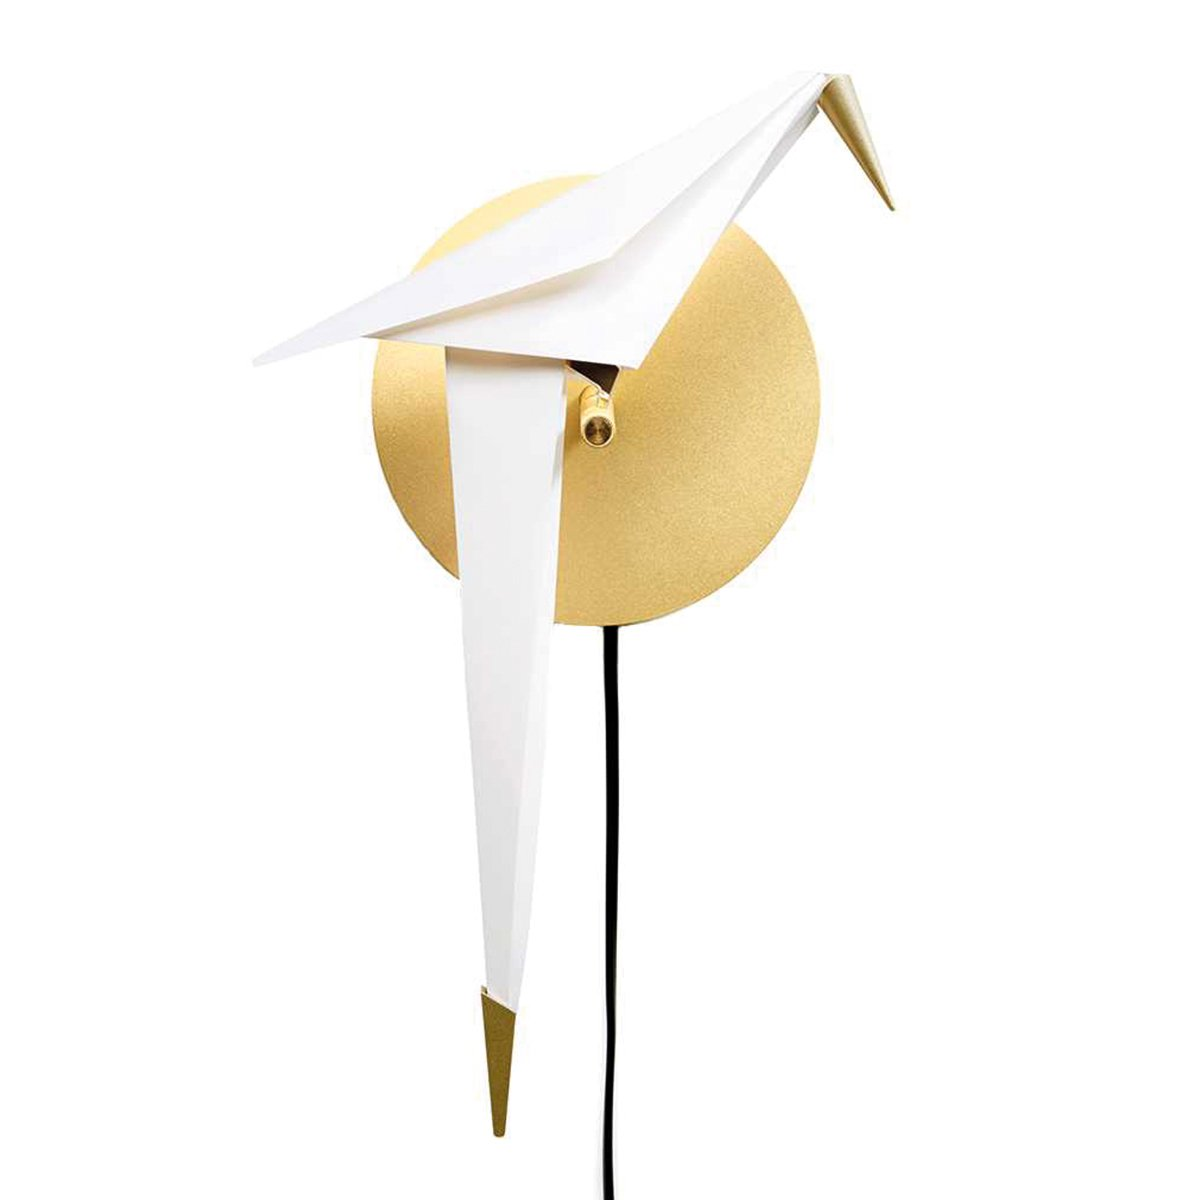 Moooi Perch Wandlamp Met Snoer Small